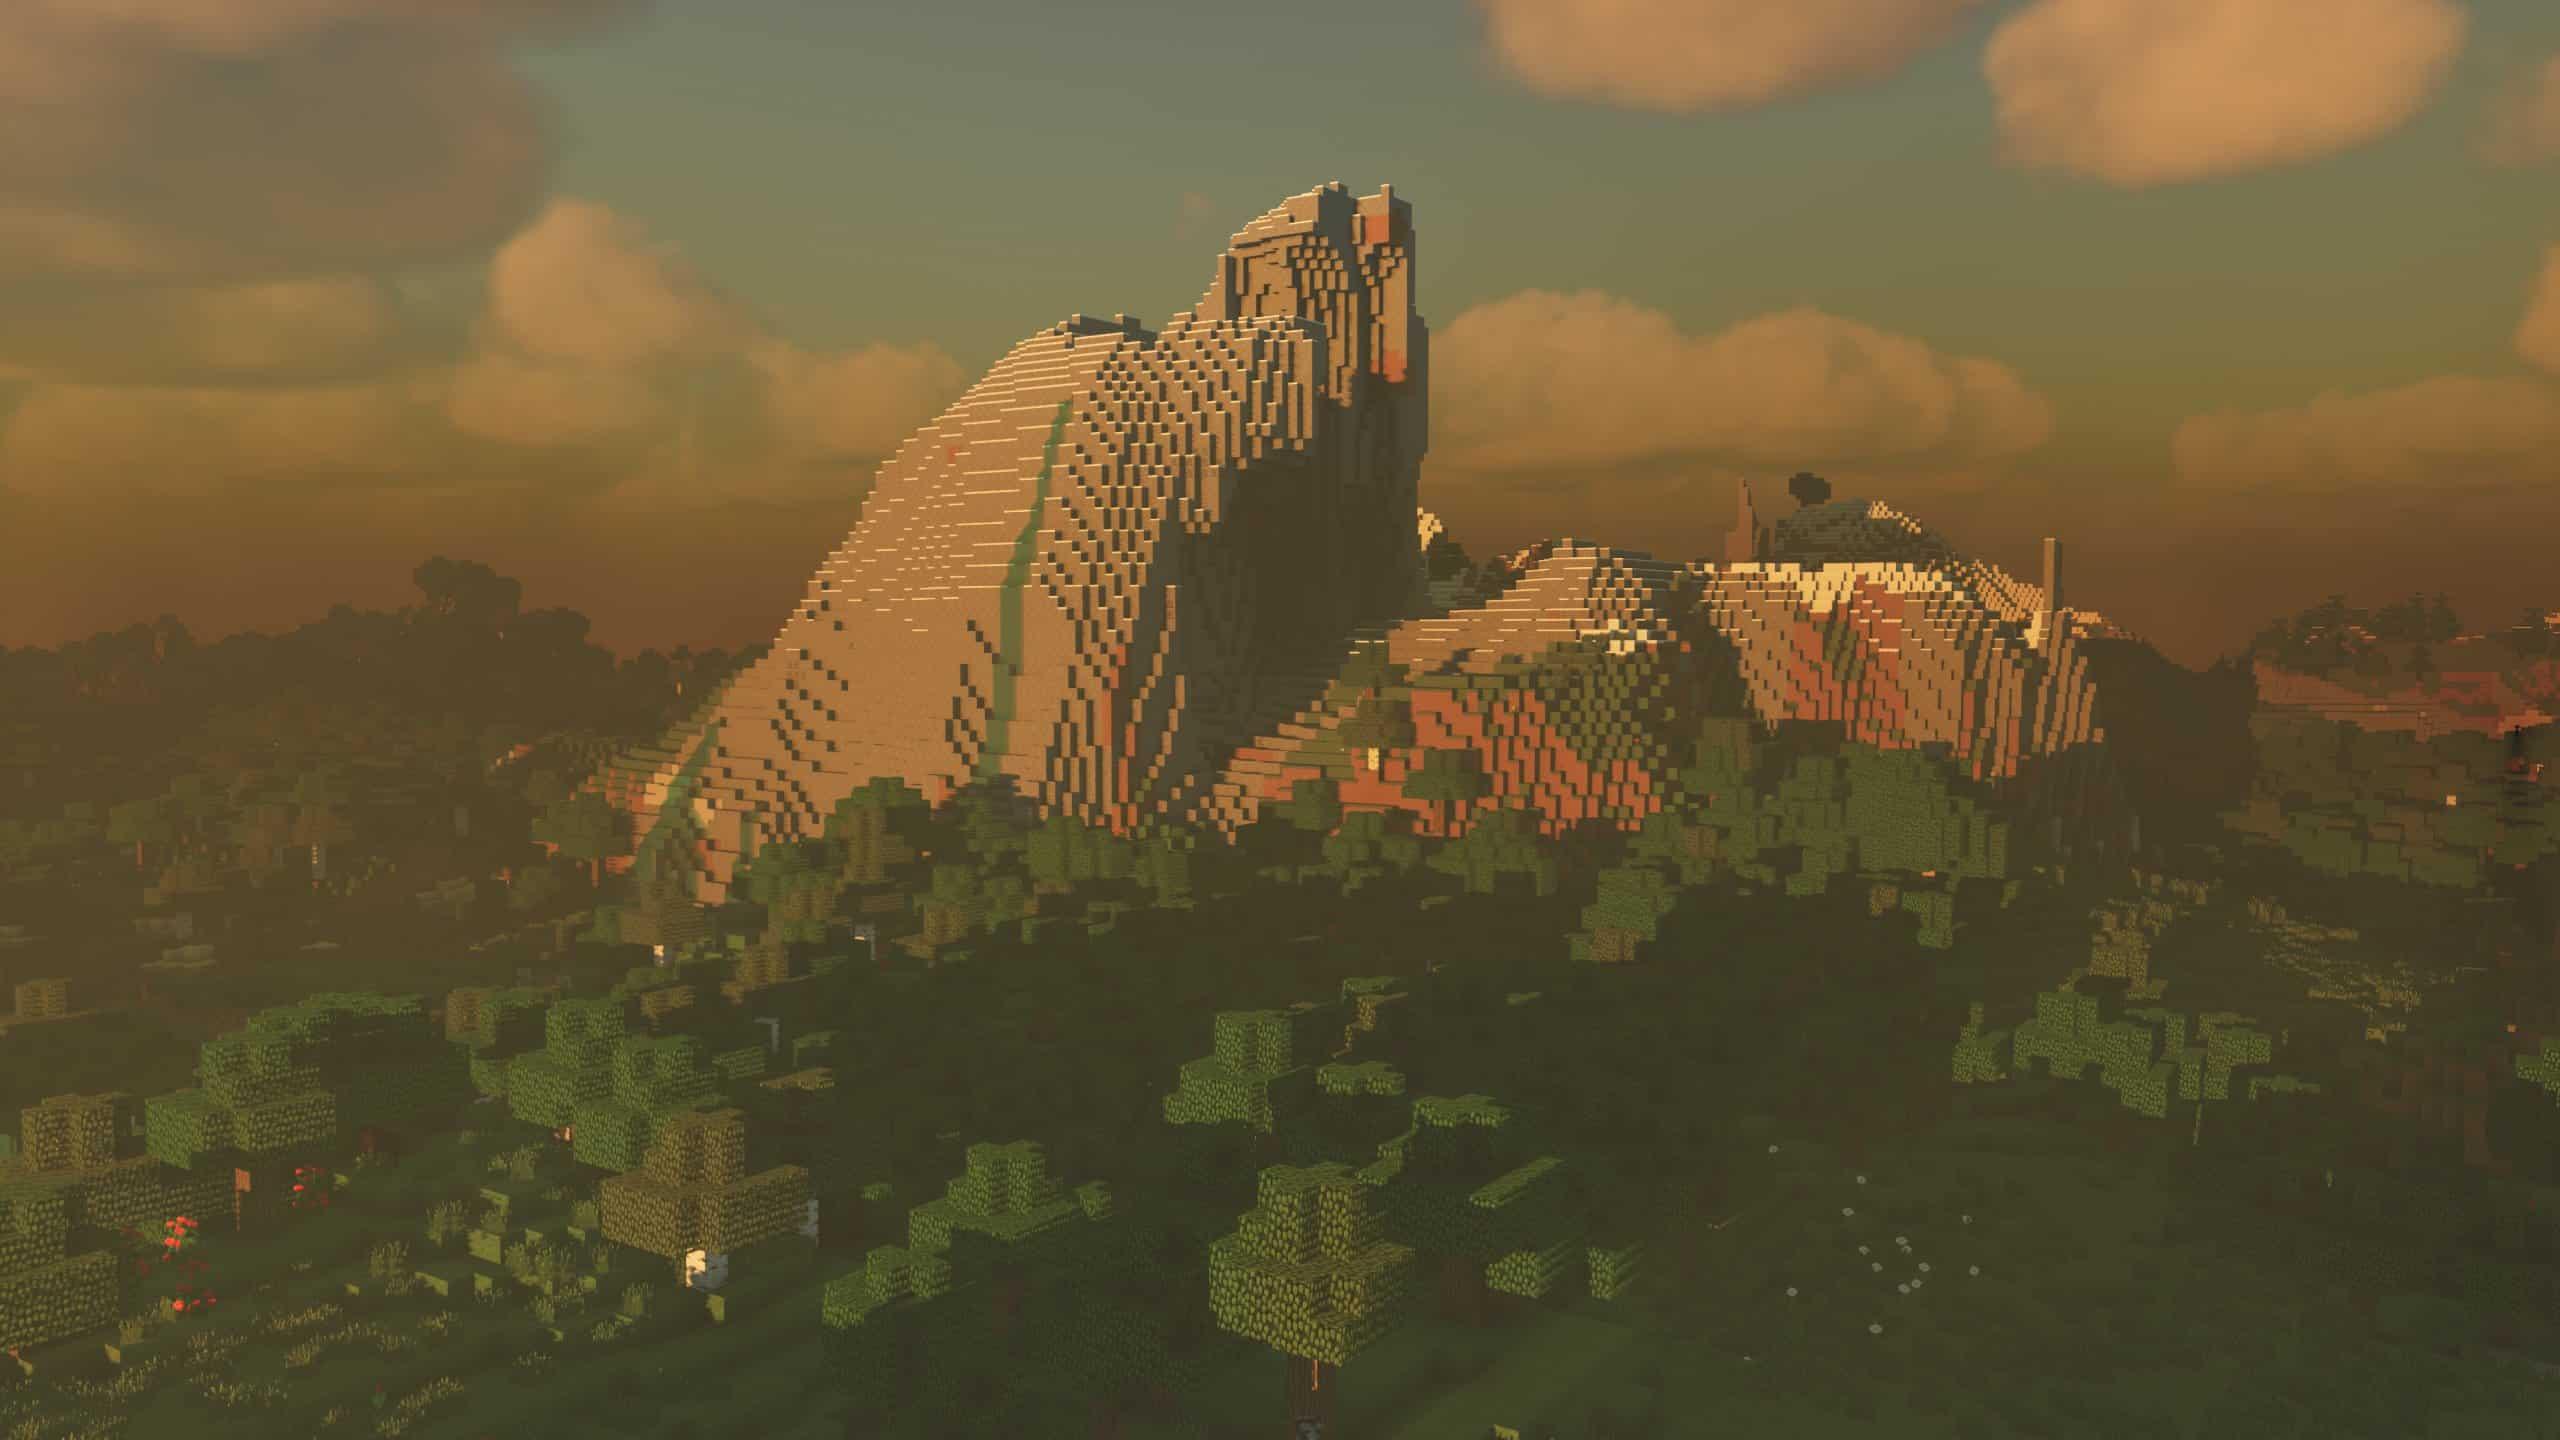 Kappa Shader : De grandes Montagnes avec une forêt